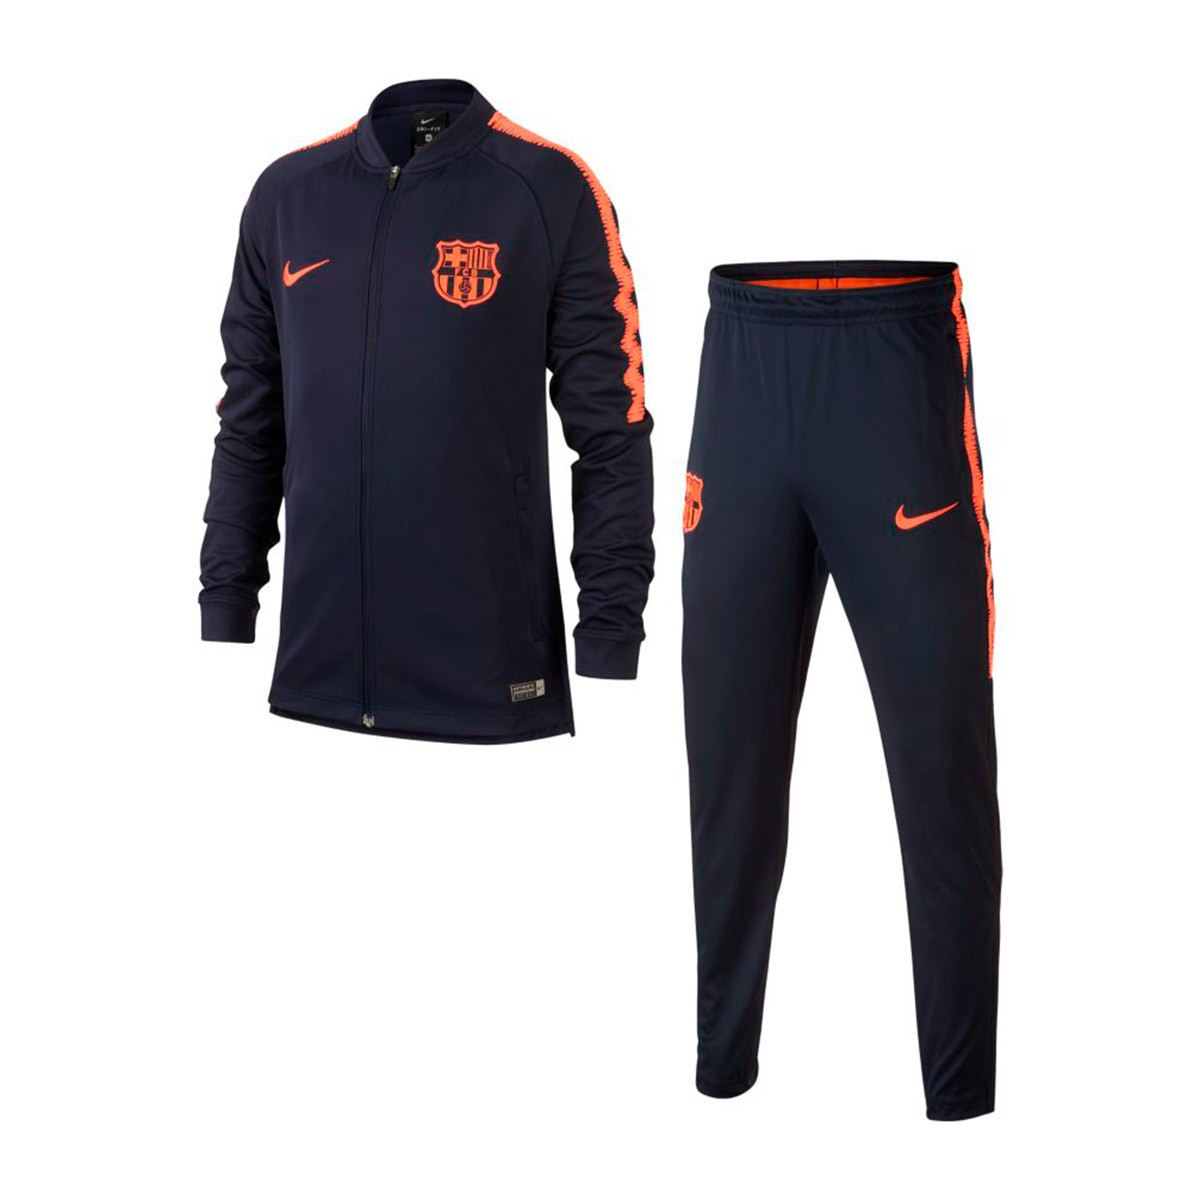 43a2a3256c53e Tracksuit Nike FC Barcelona Dry Squad 2017-2018 Kids Obsidian-Hyper ...